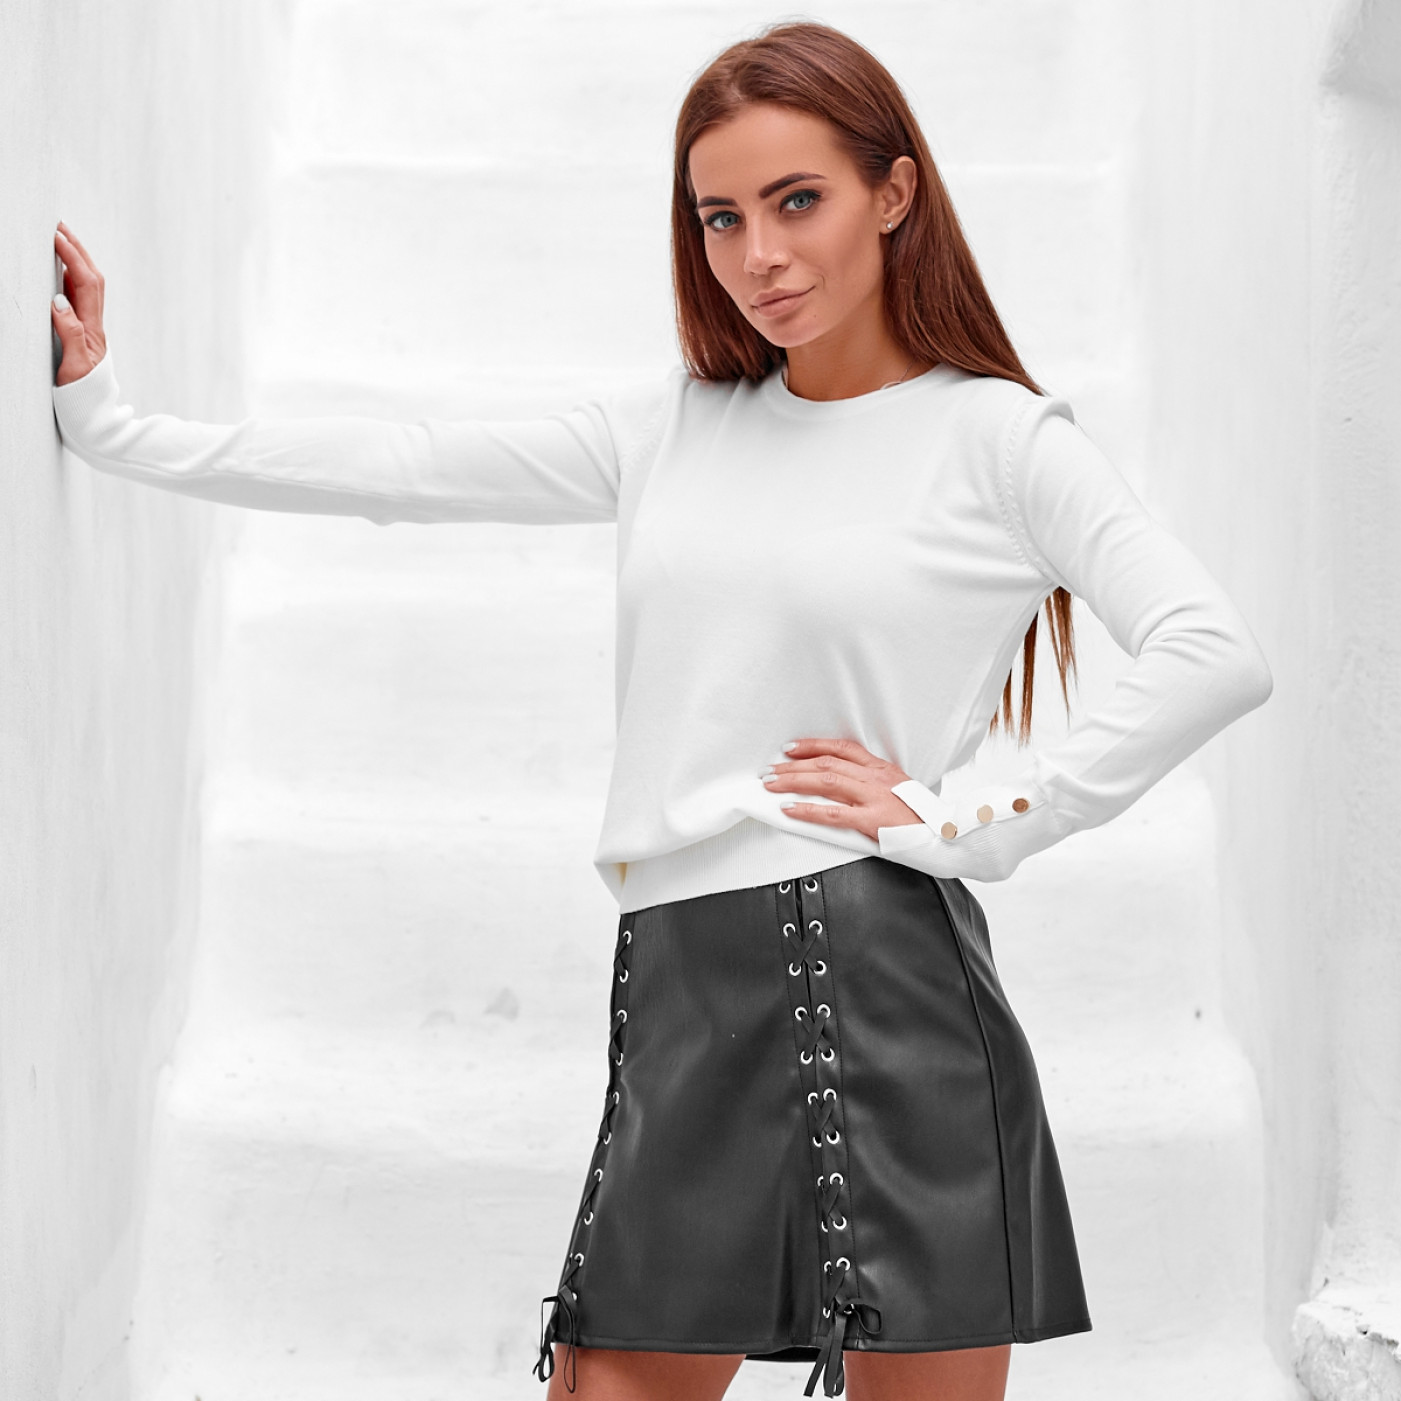 Кожаная юбка со шунровкой 40470